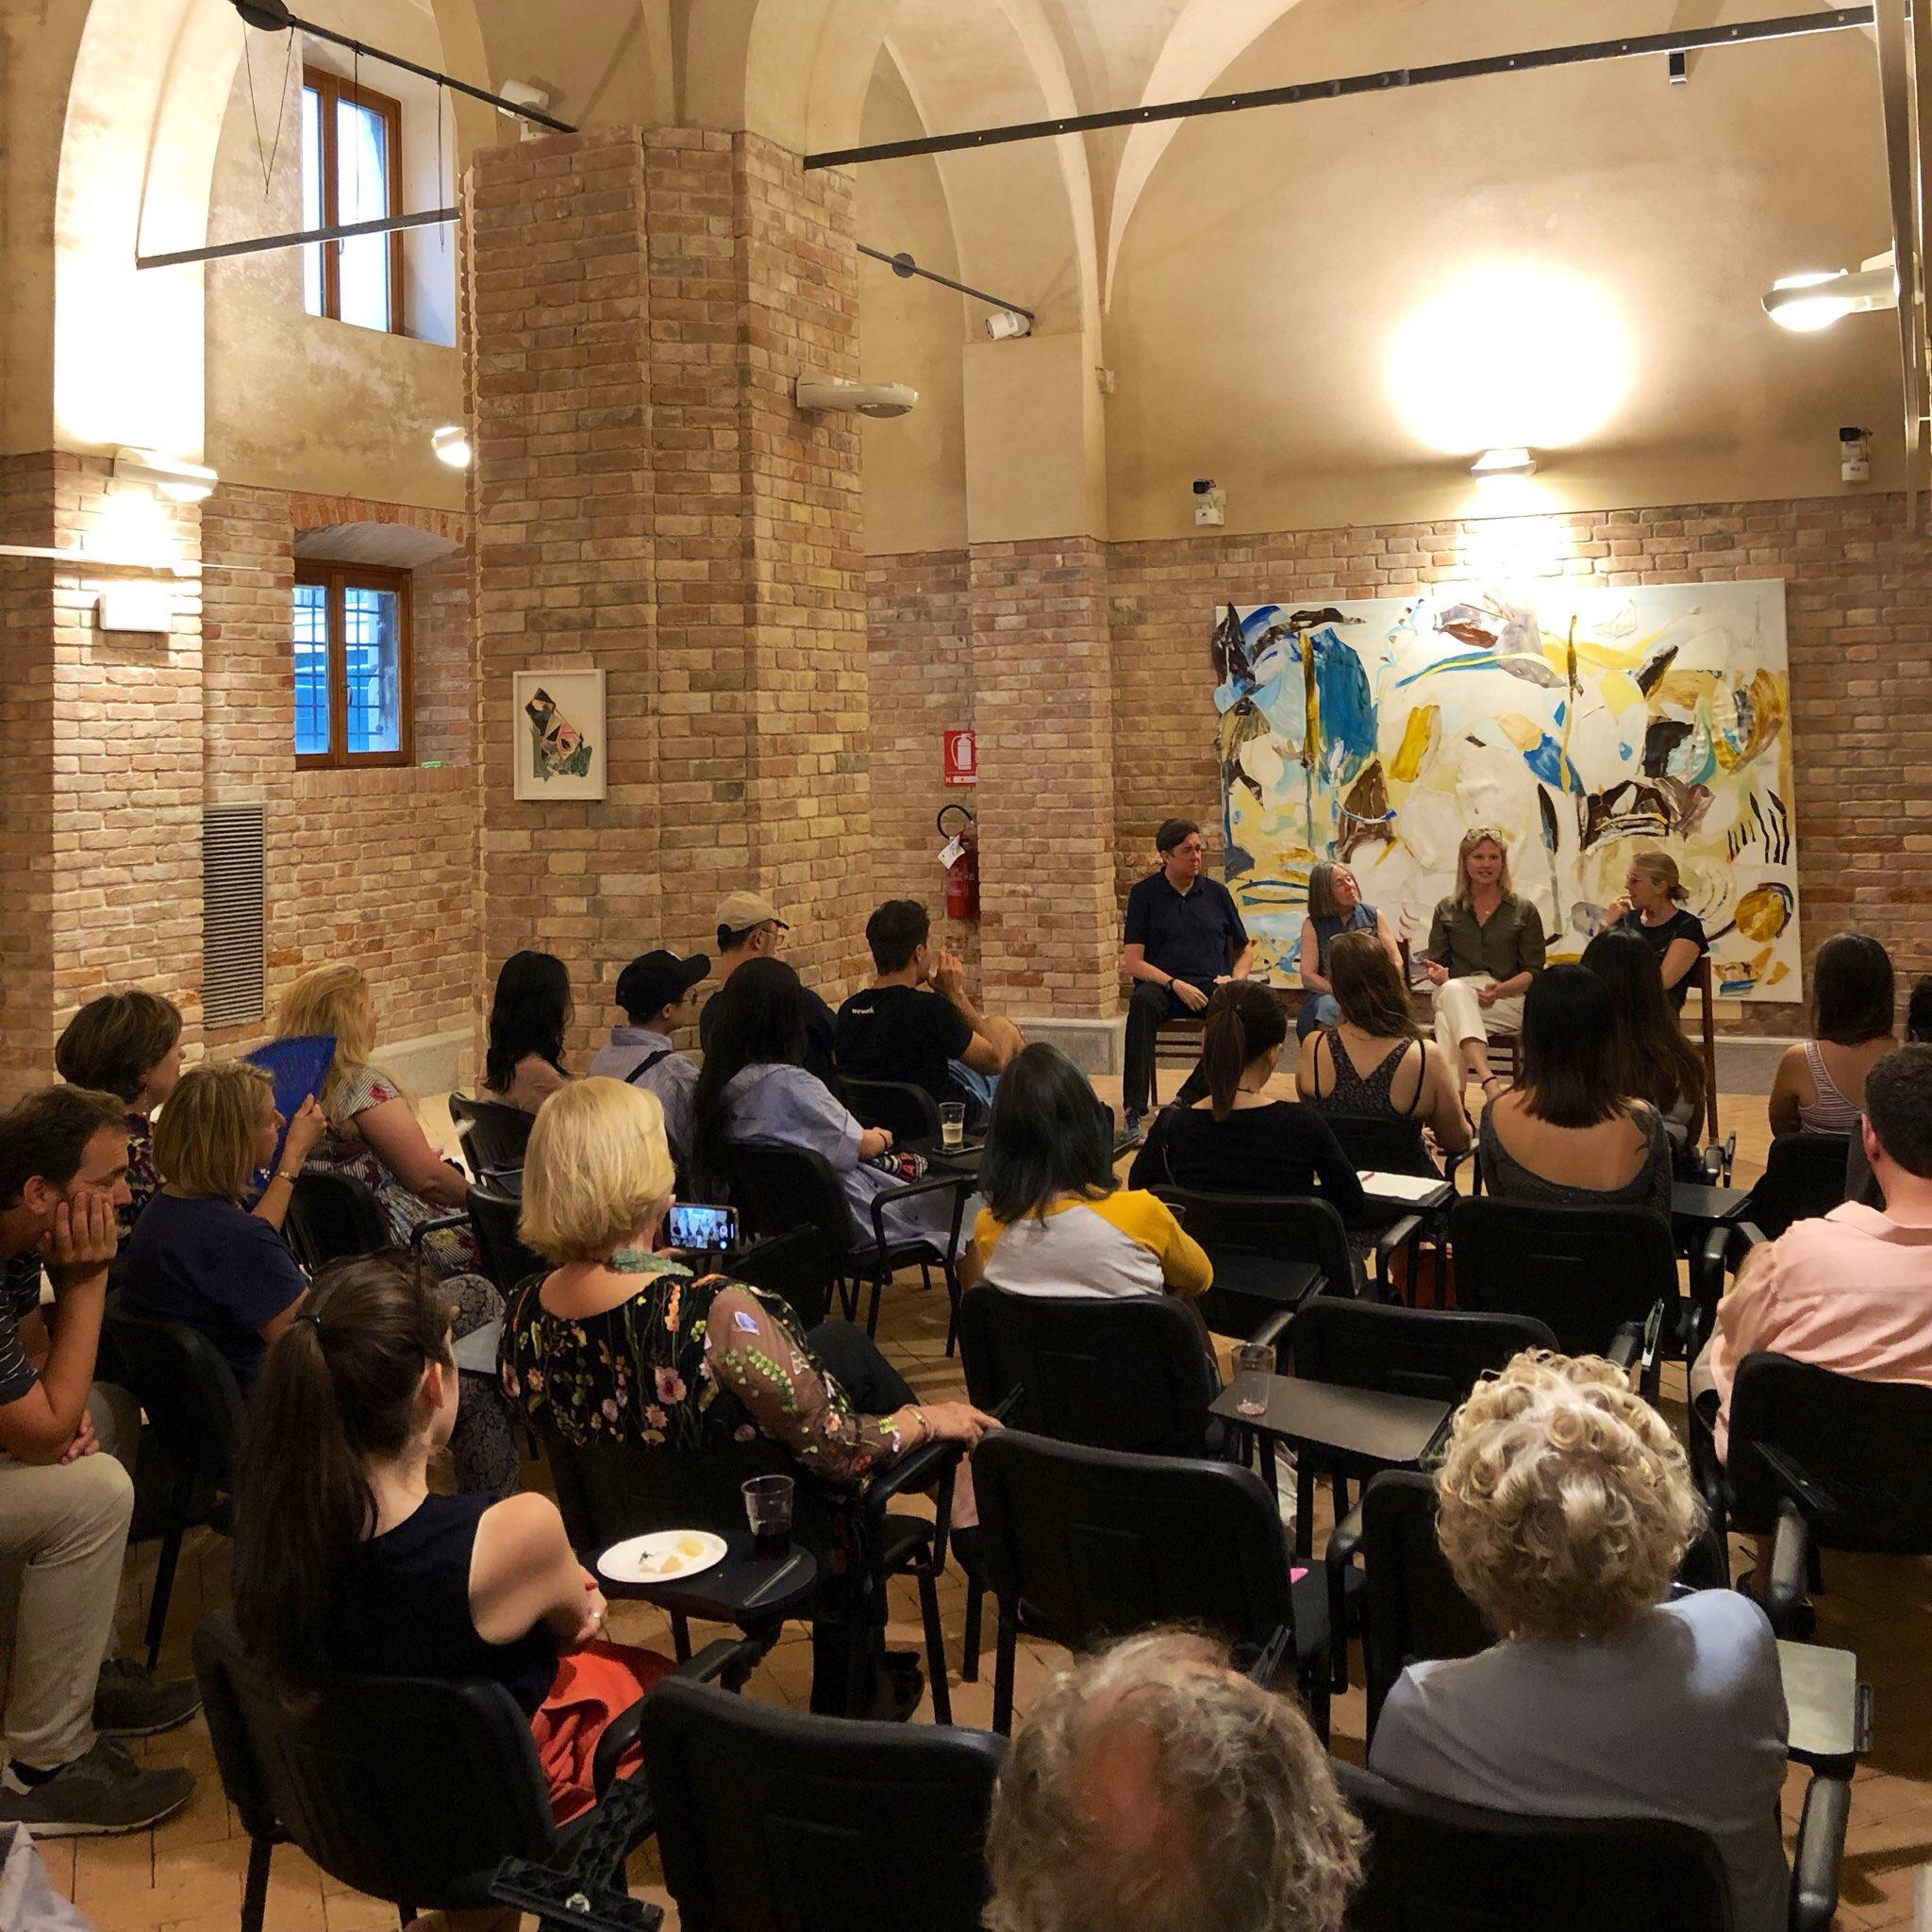 Pratt in Venice-organized panel for  Art Night 2019 , featuring exhibiting artists Michael Brennan, Monique Rollins, curator Martina Cavallarin, and Pratt in Venice Director Diana Gisolfi.